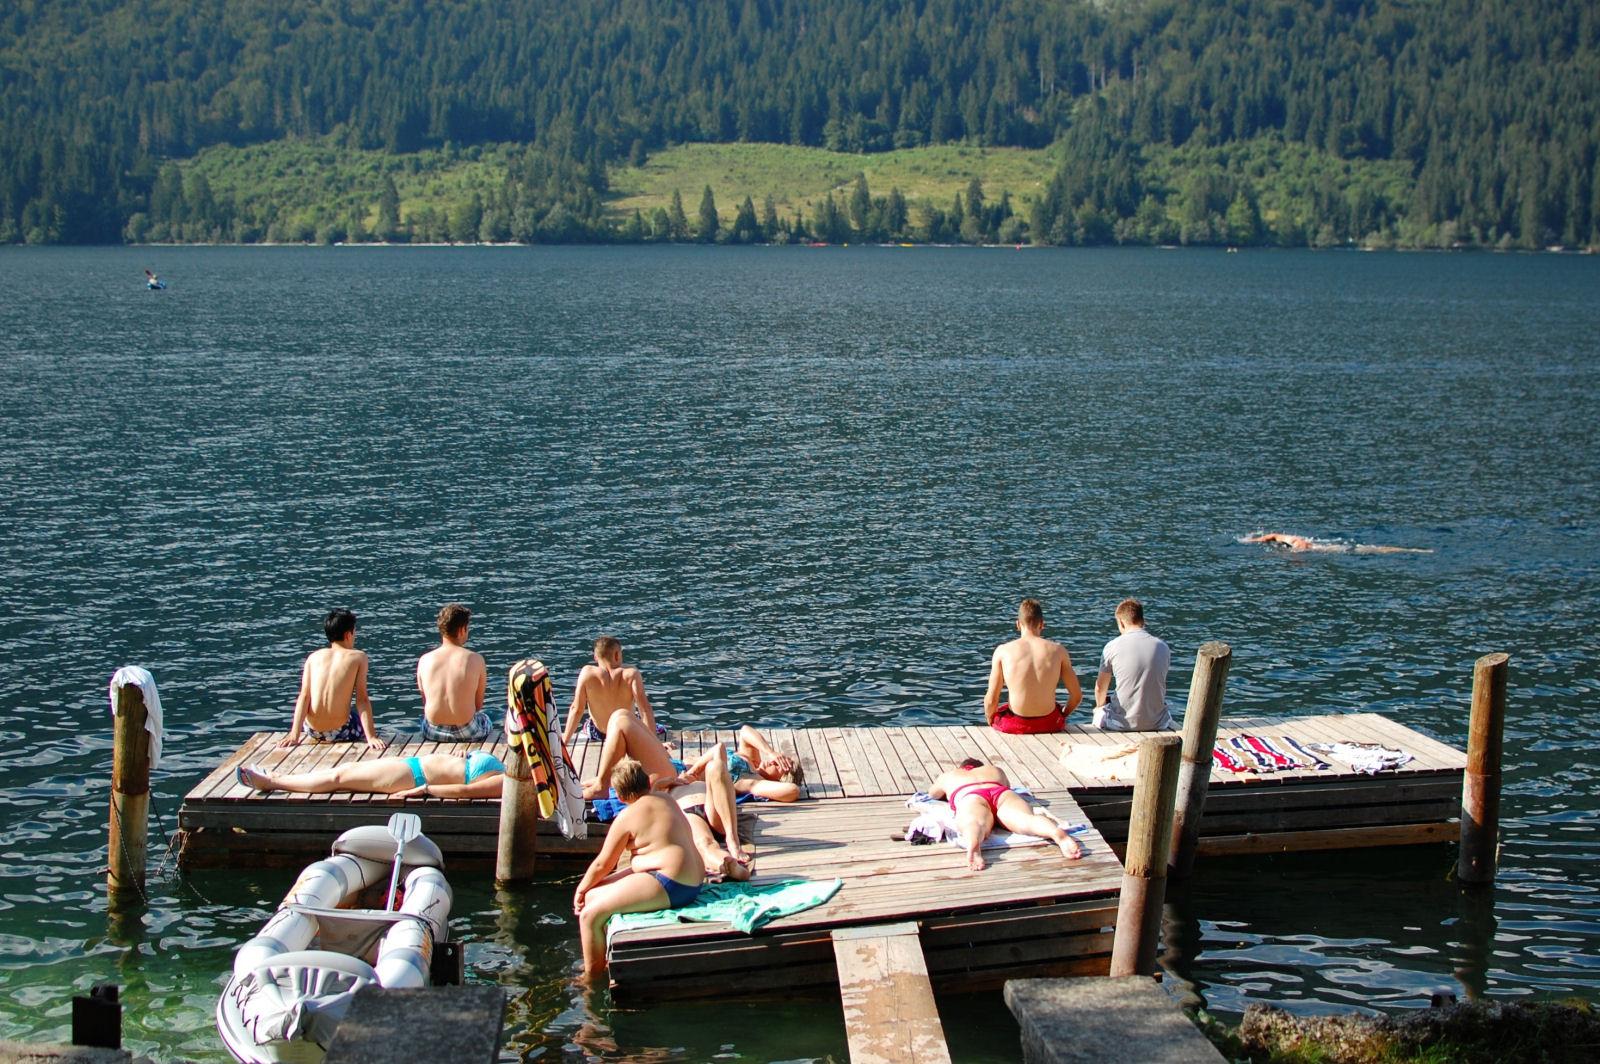 lake-bohinj-summer-swimming